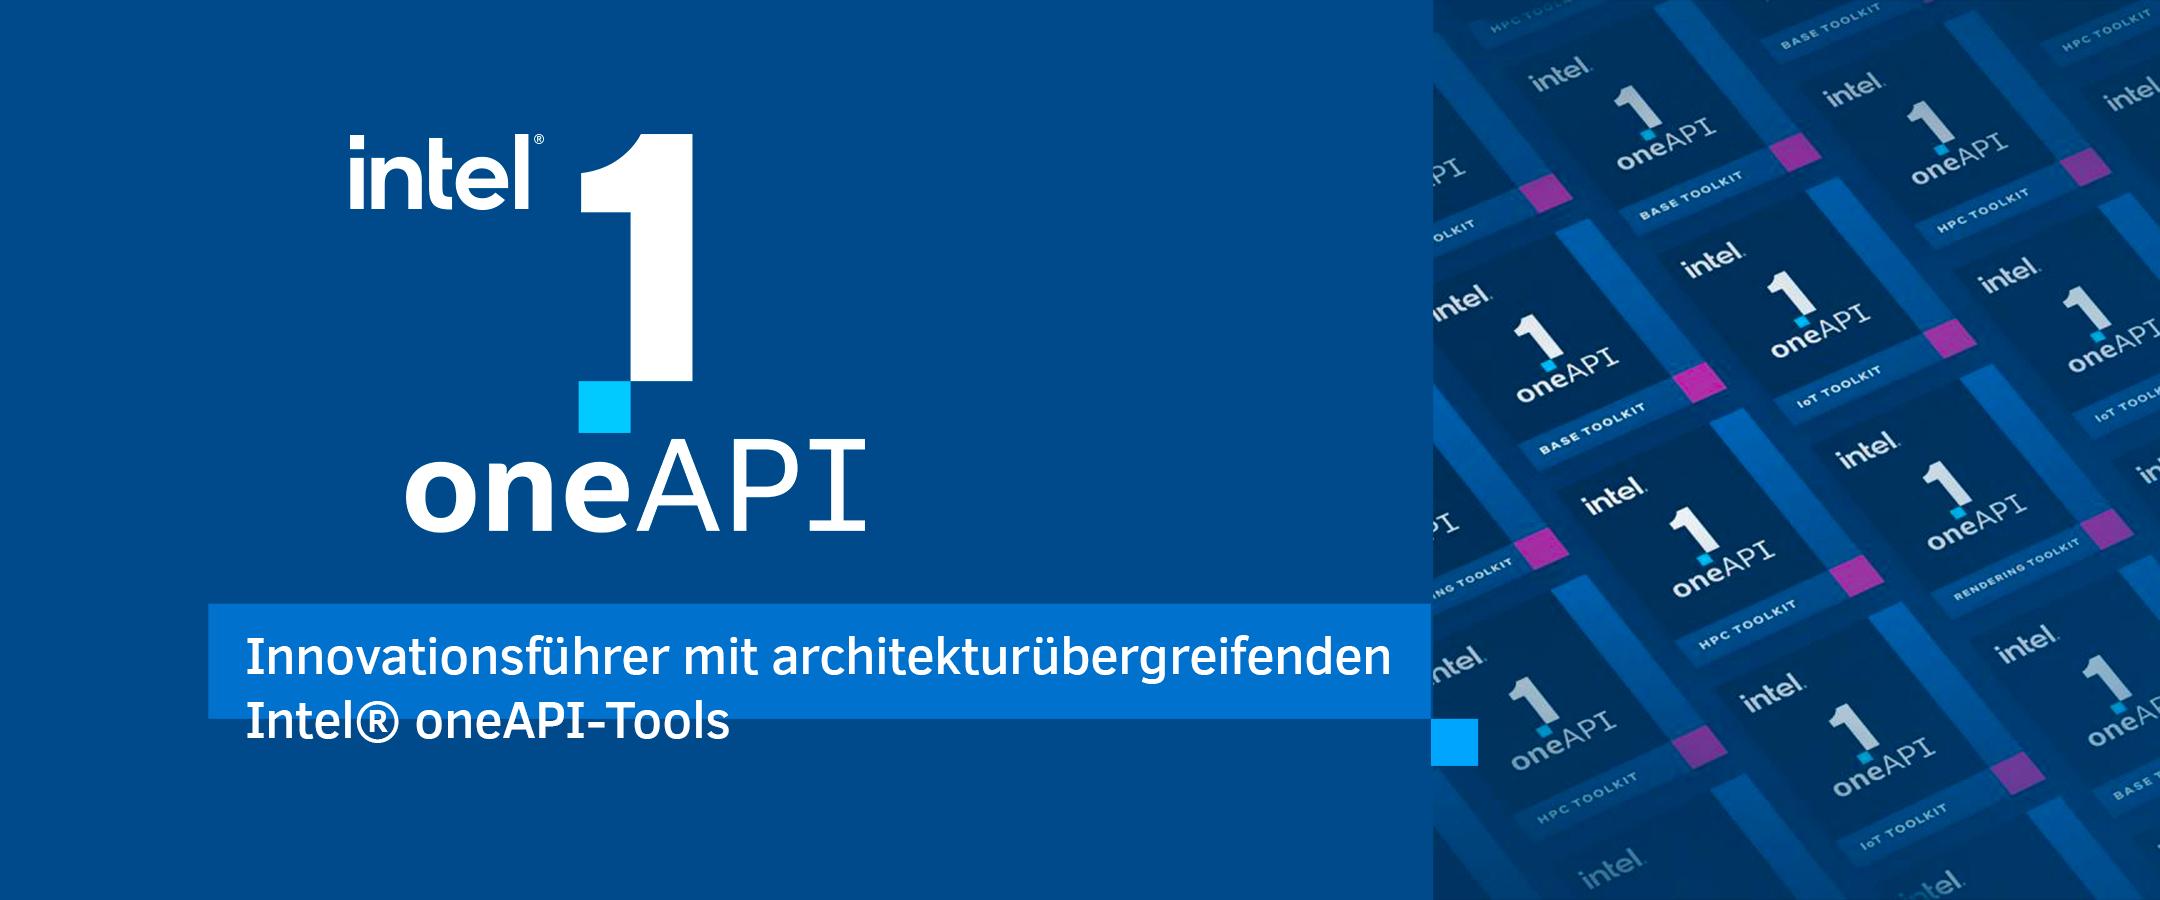 Innovationsführer mit architekturübergreifenden Intel® oneAPI-Tools